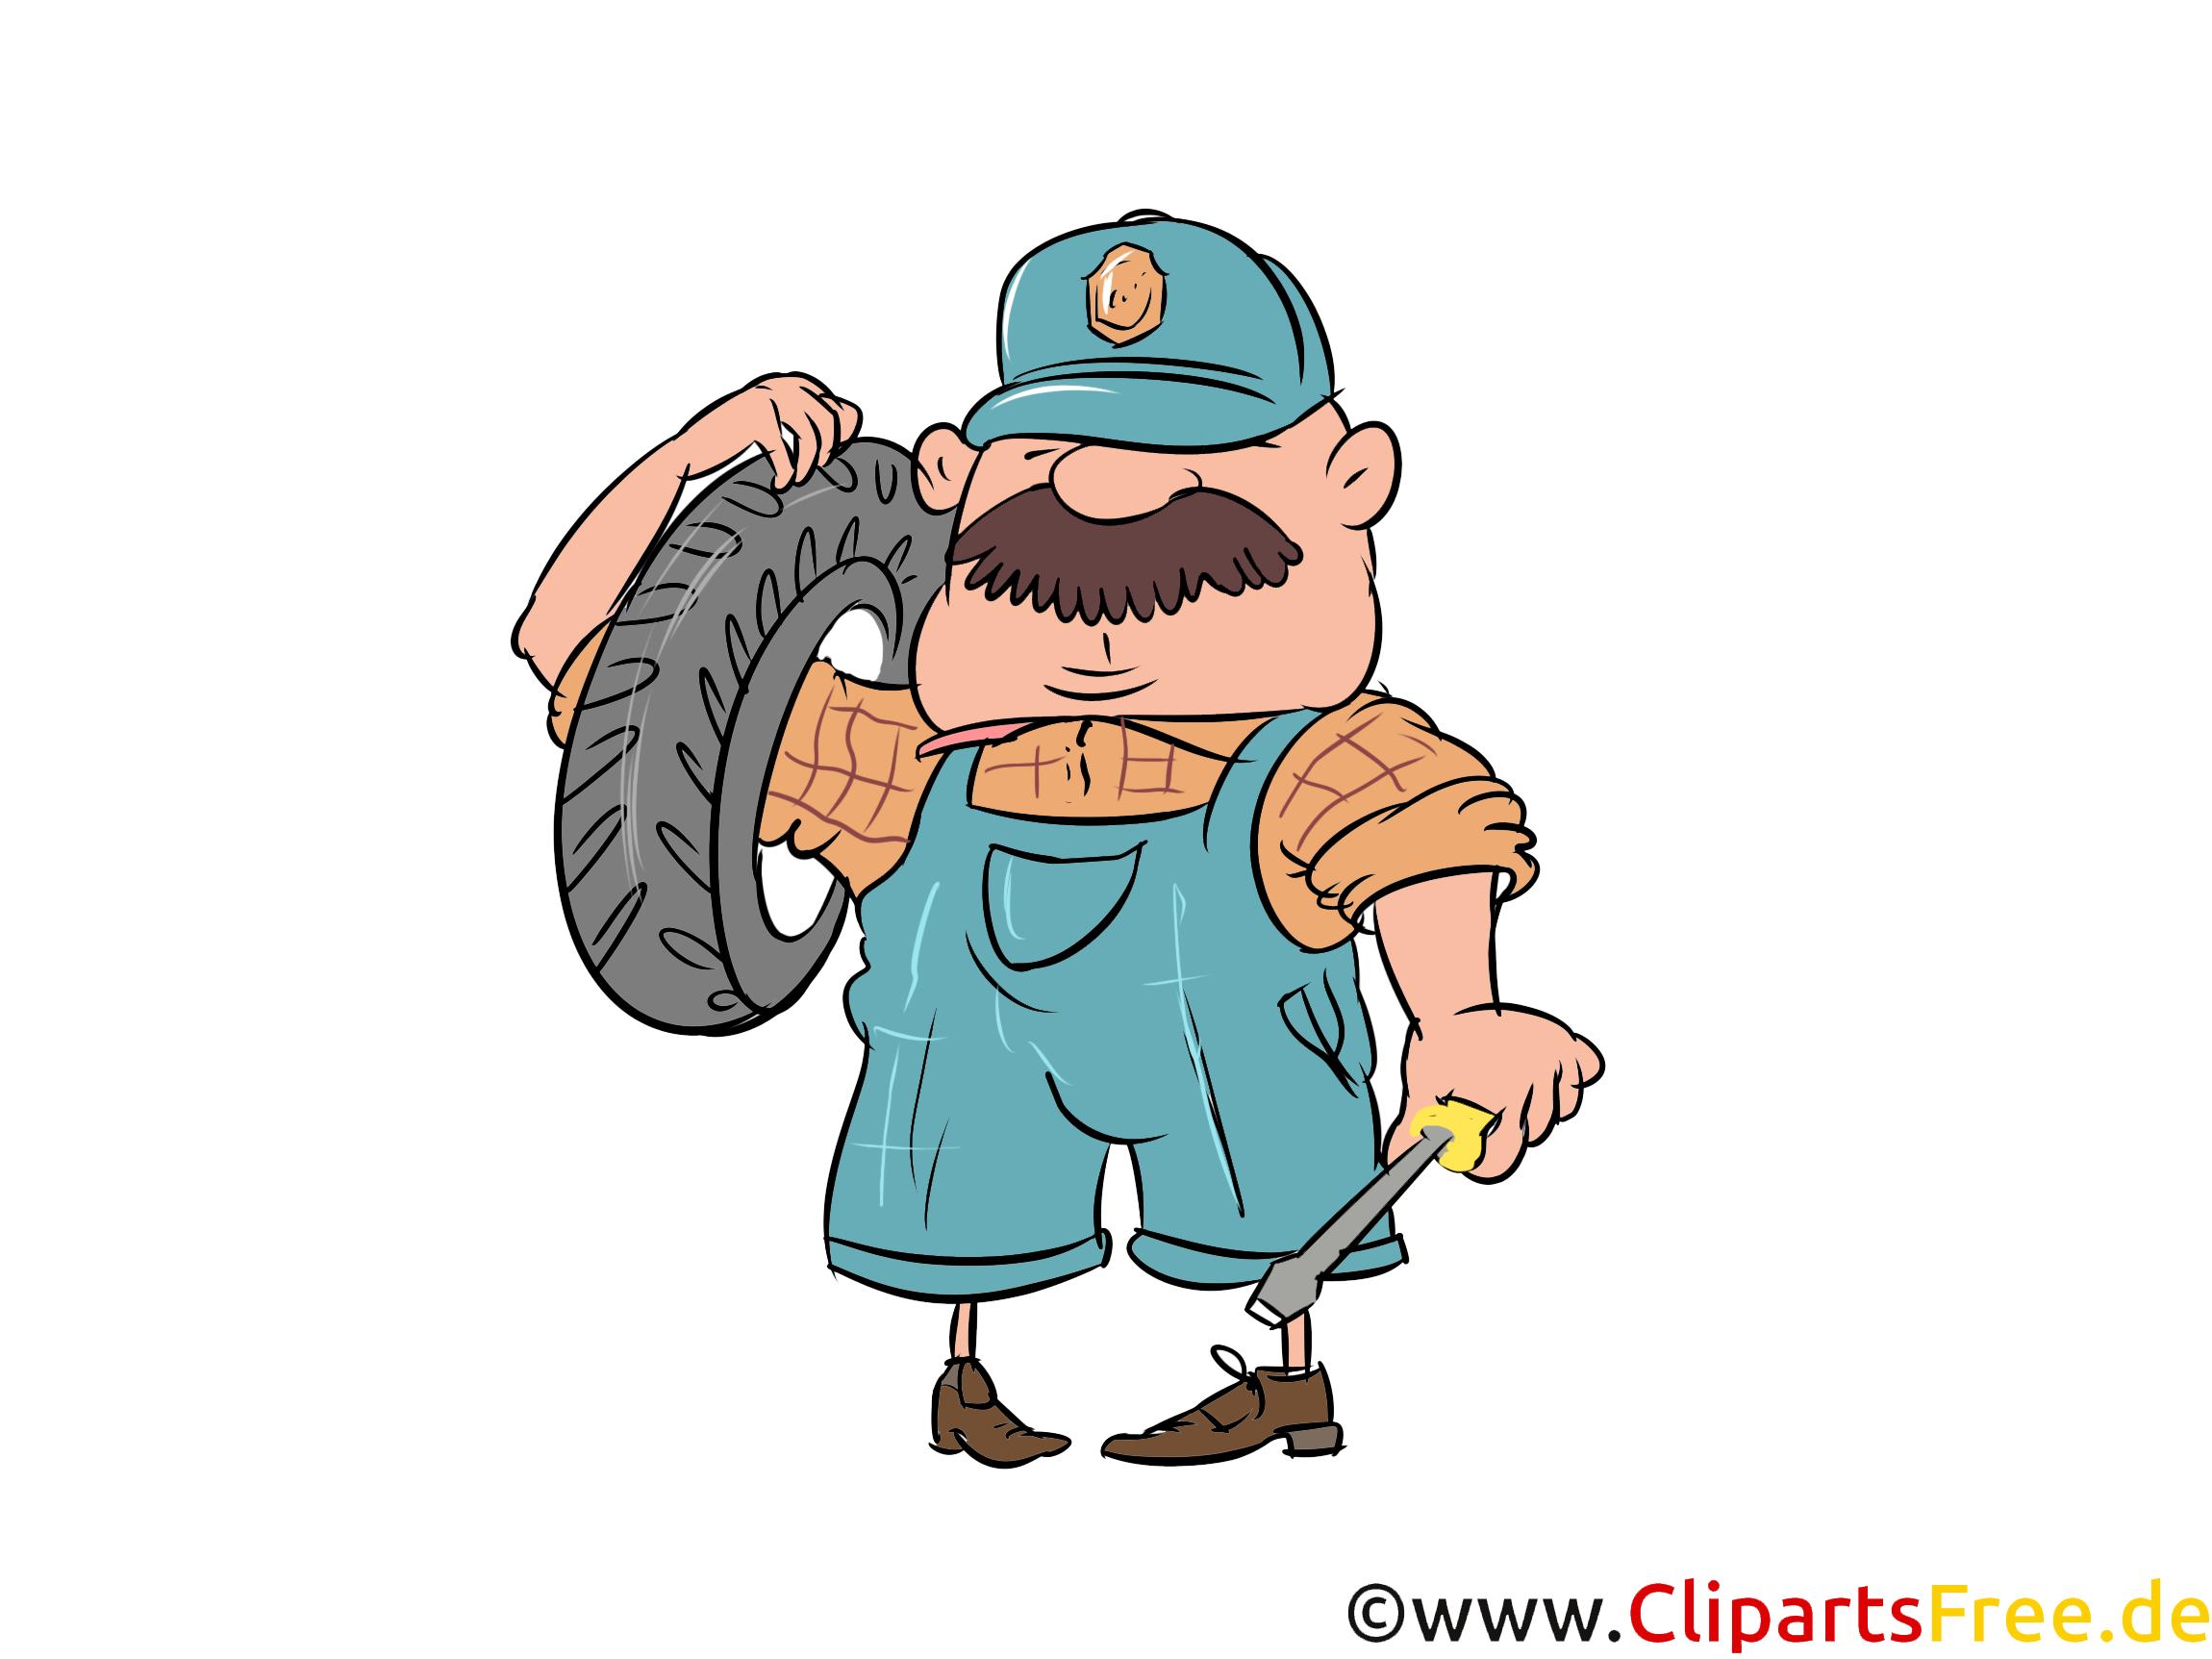 Reifenservice Bild, Illustration, Clipart, Cartoon gratis